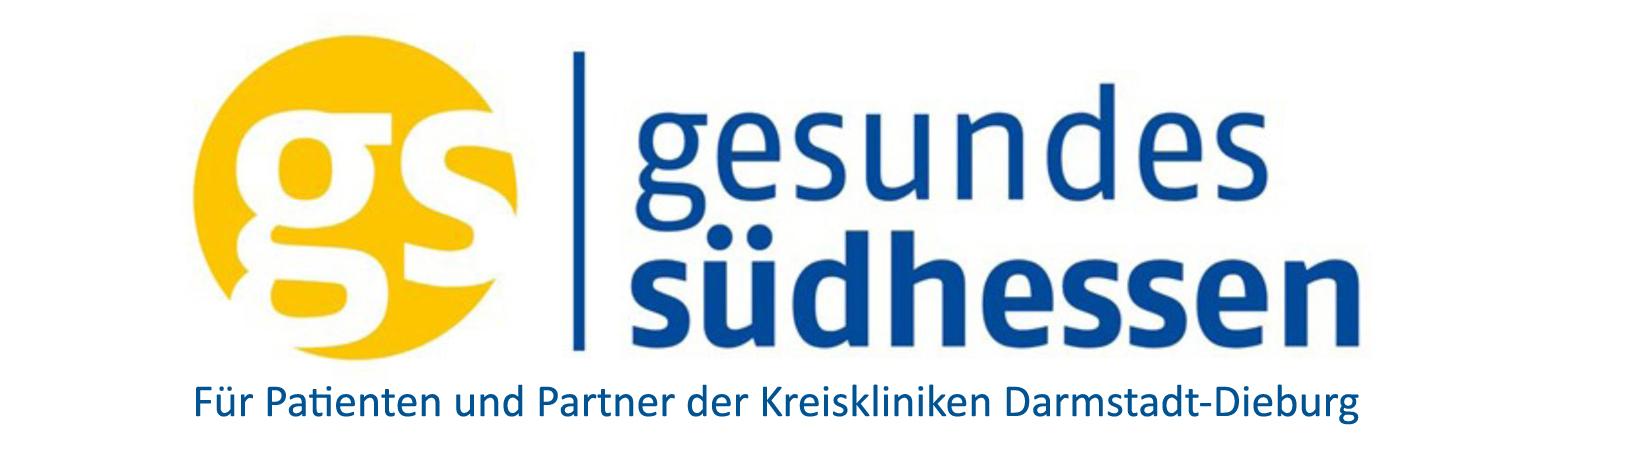 Gesundes-Südhessen.de